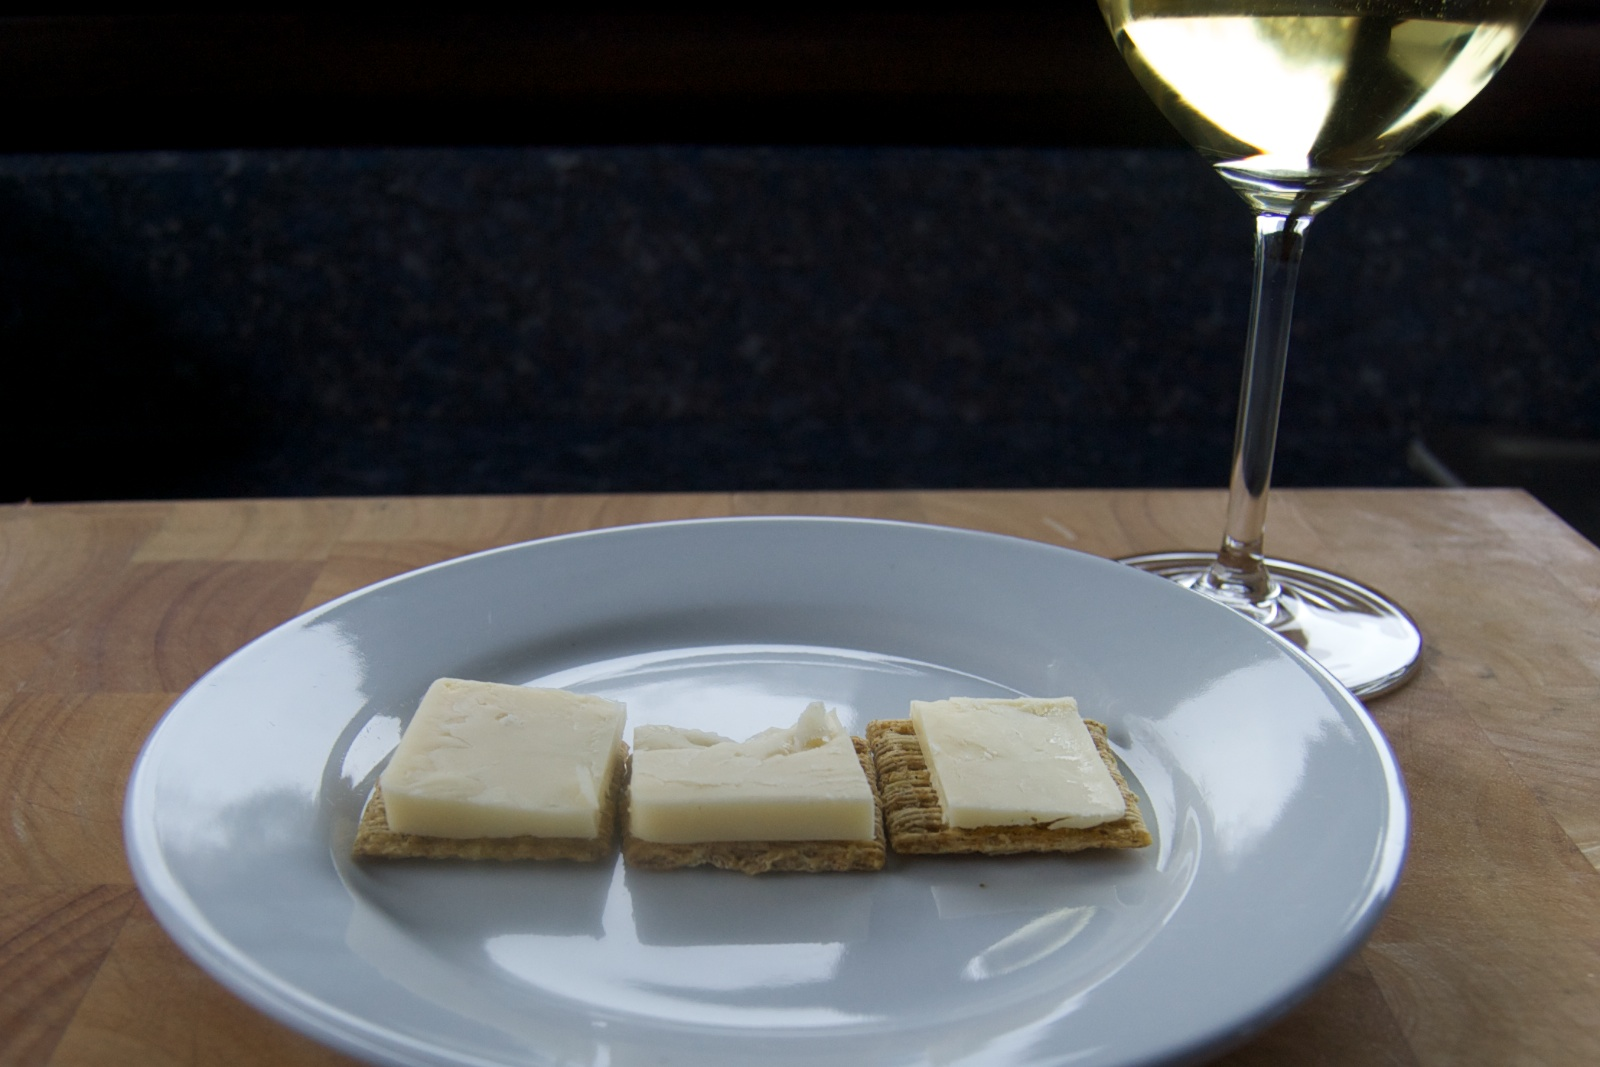 http://blog.rickk.com/food/2011/10/27/ate.2011.10.27.s1.jpg